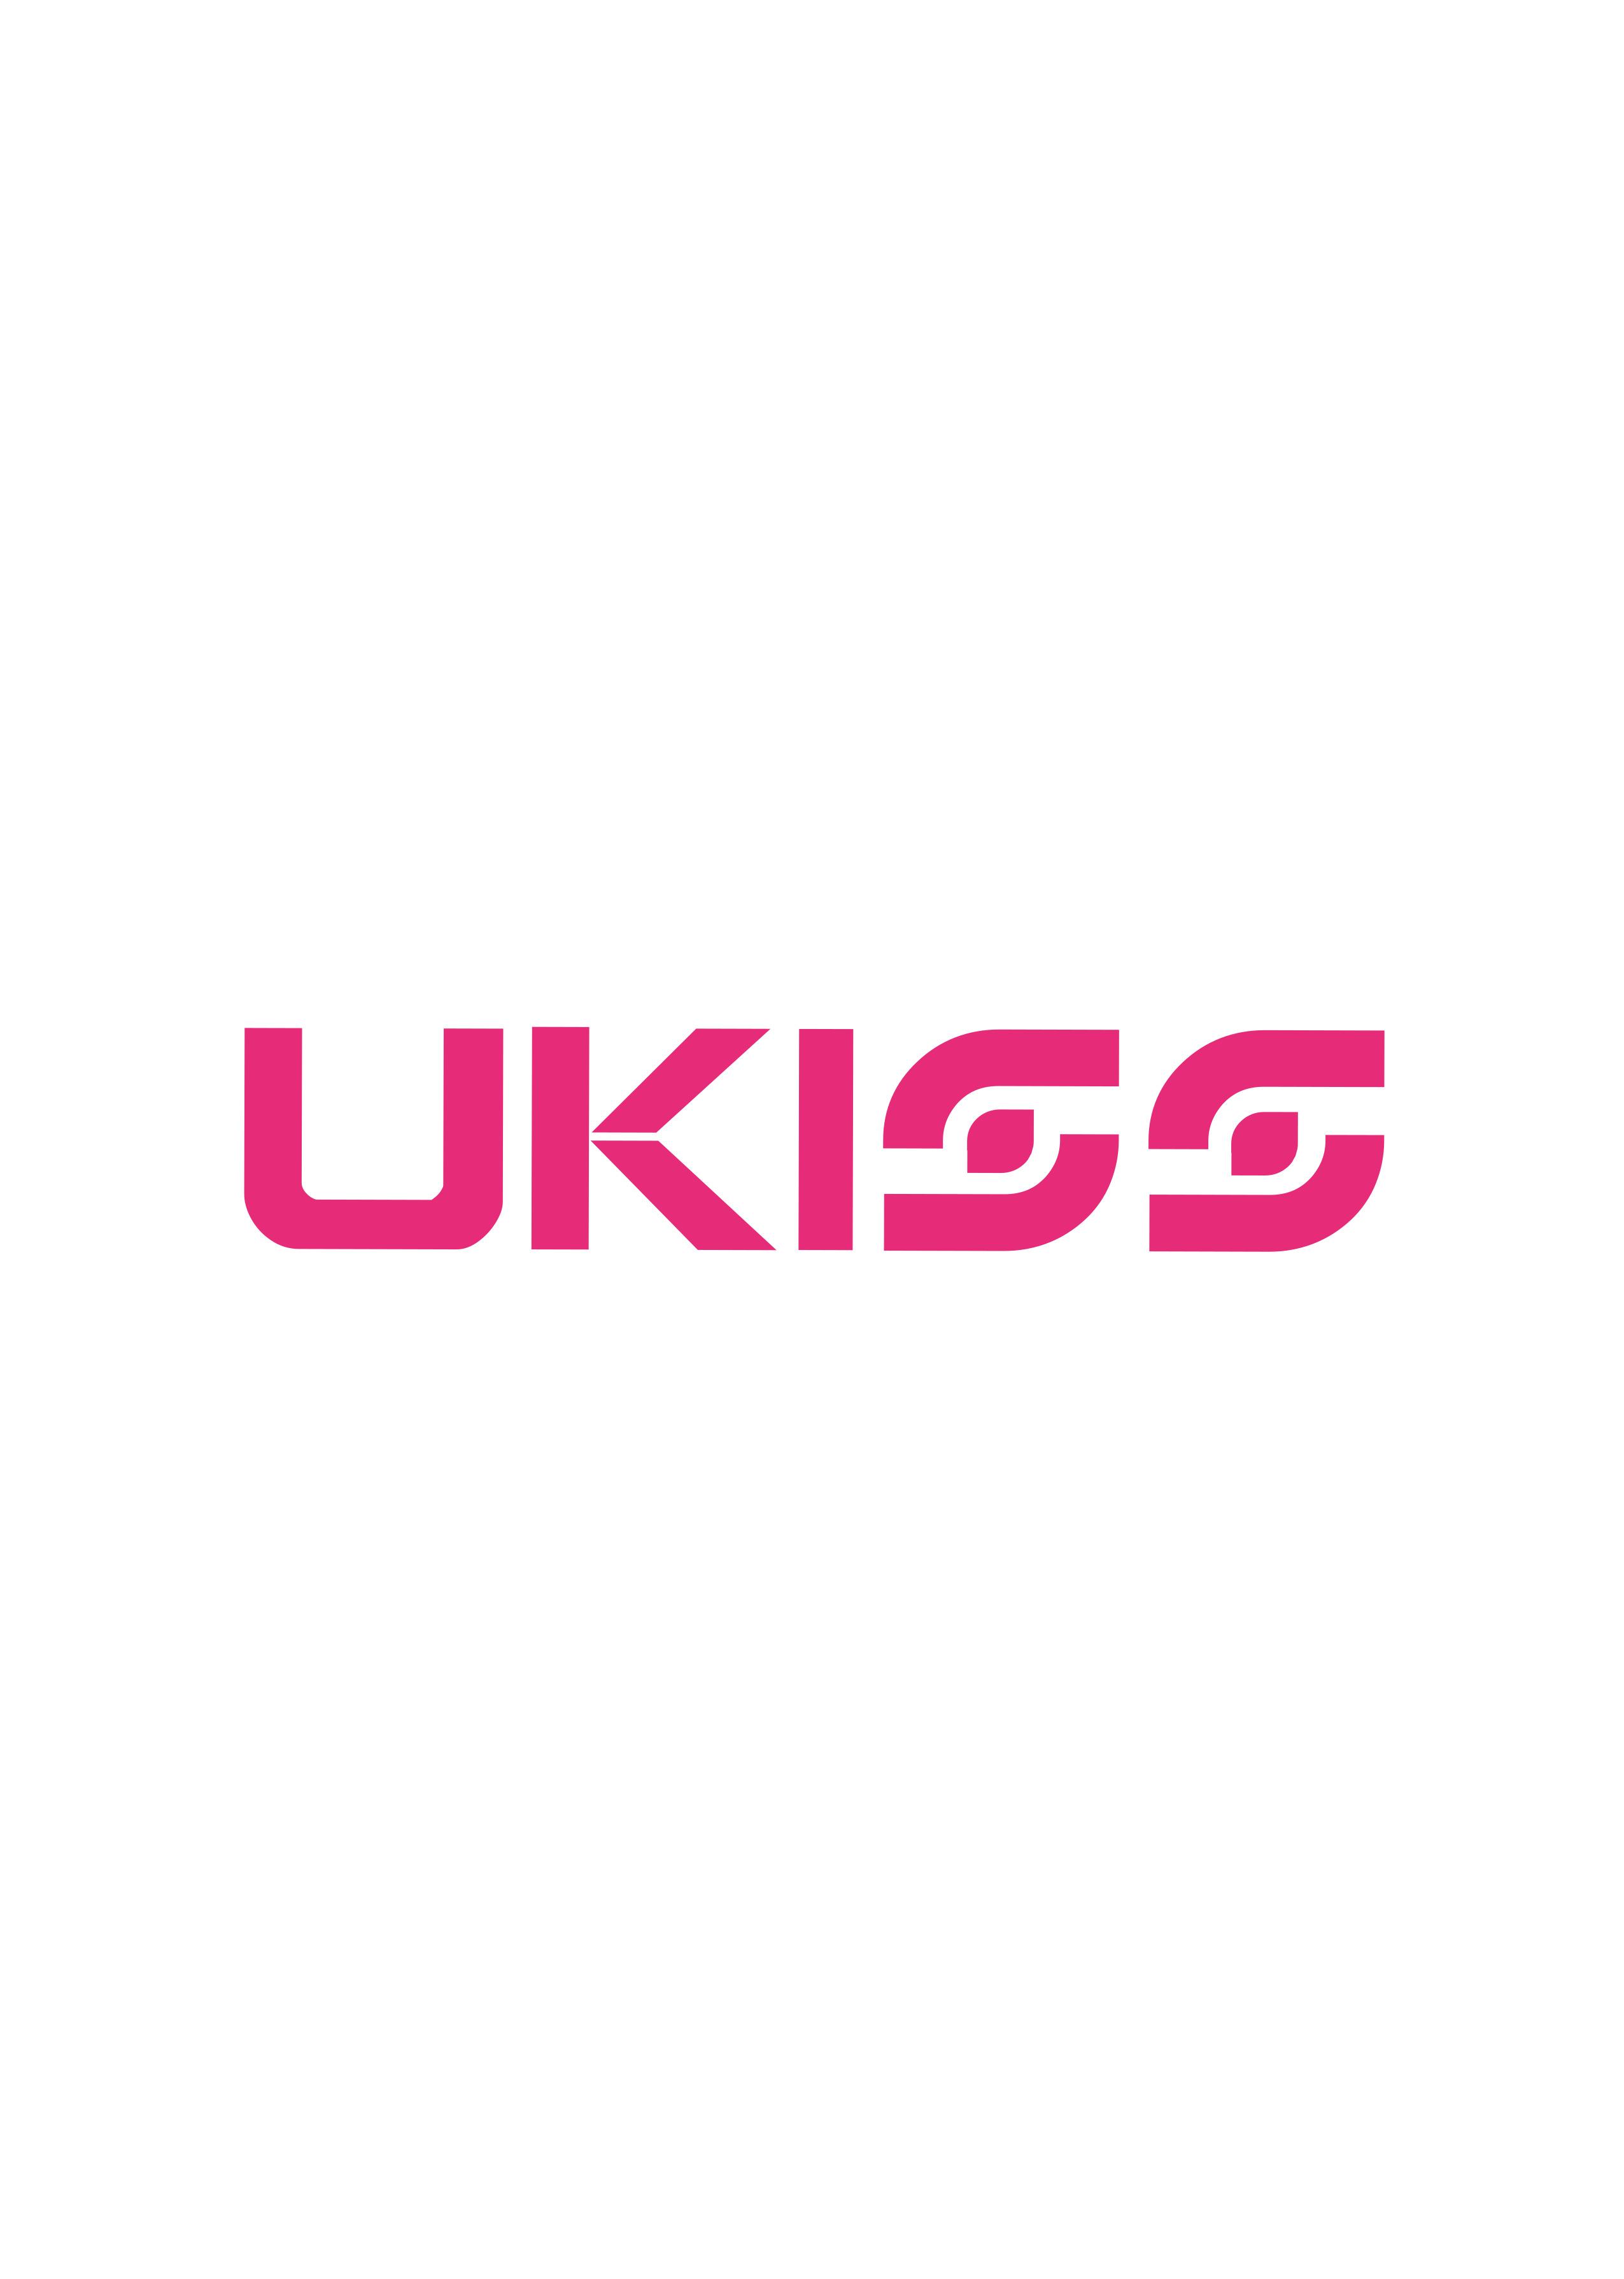 【KISSme JAPAN限定!】1対1ビデオ通話(スヒョン2部)